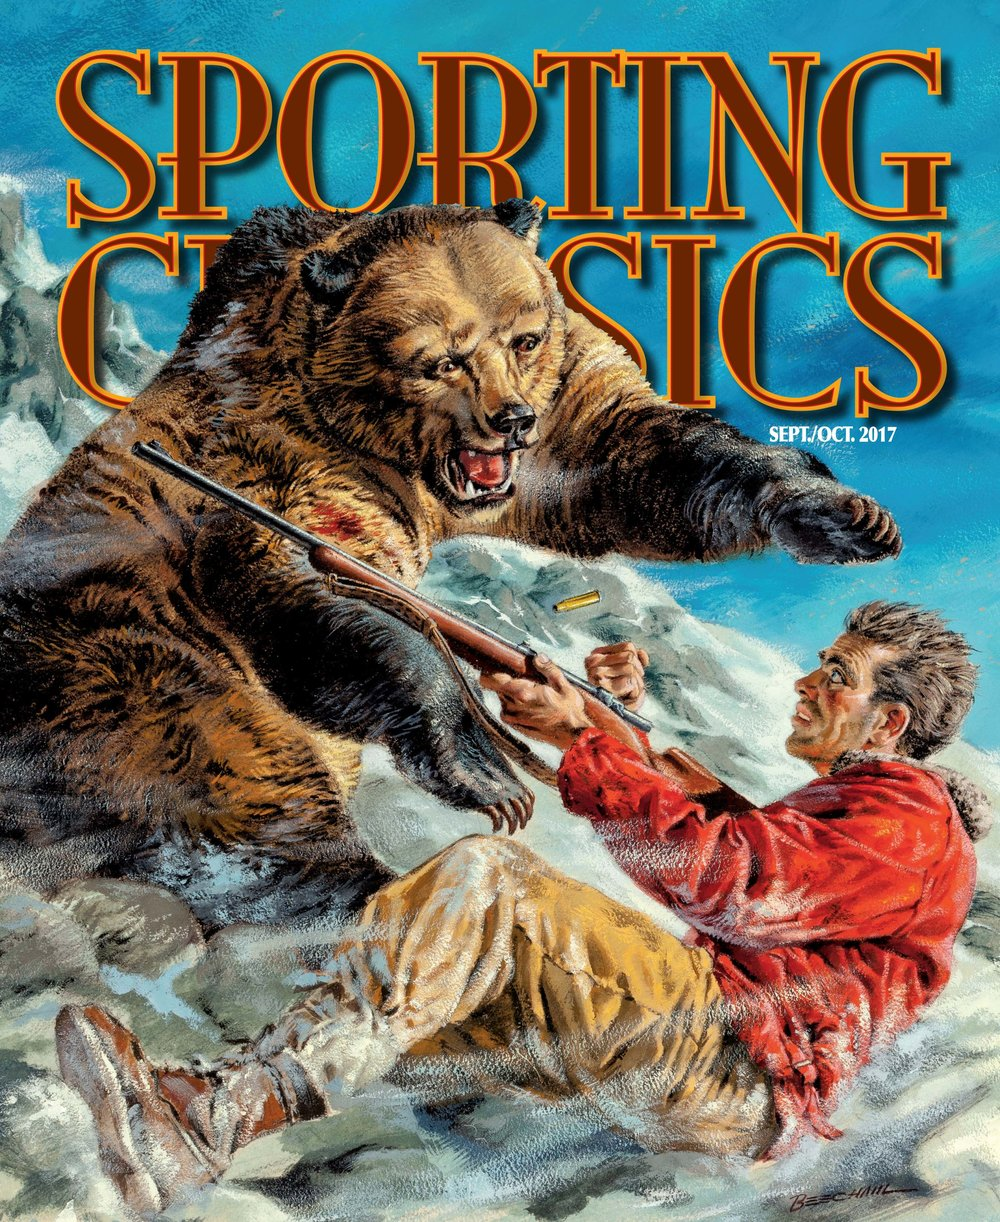 sportingclassicscover.jpg